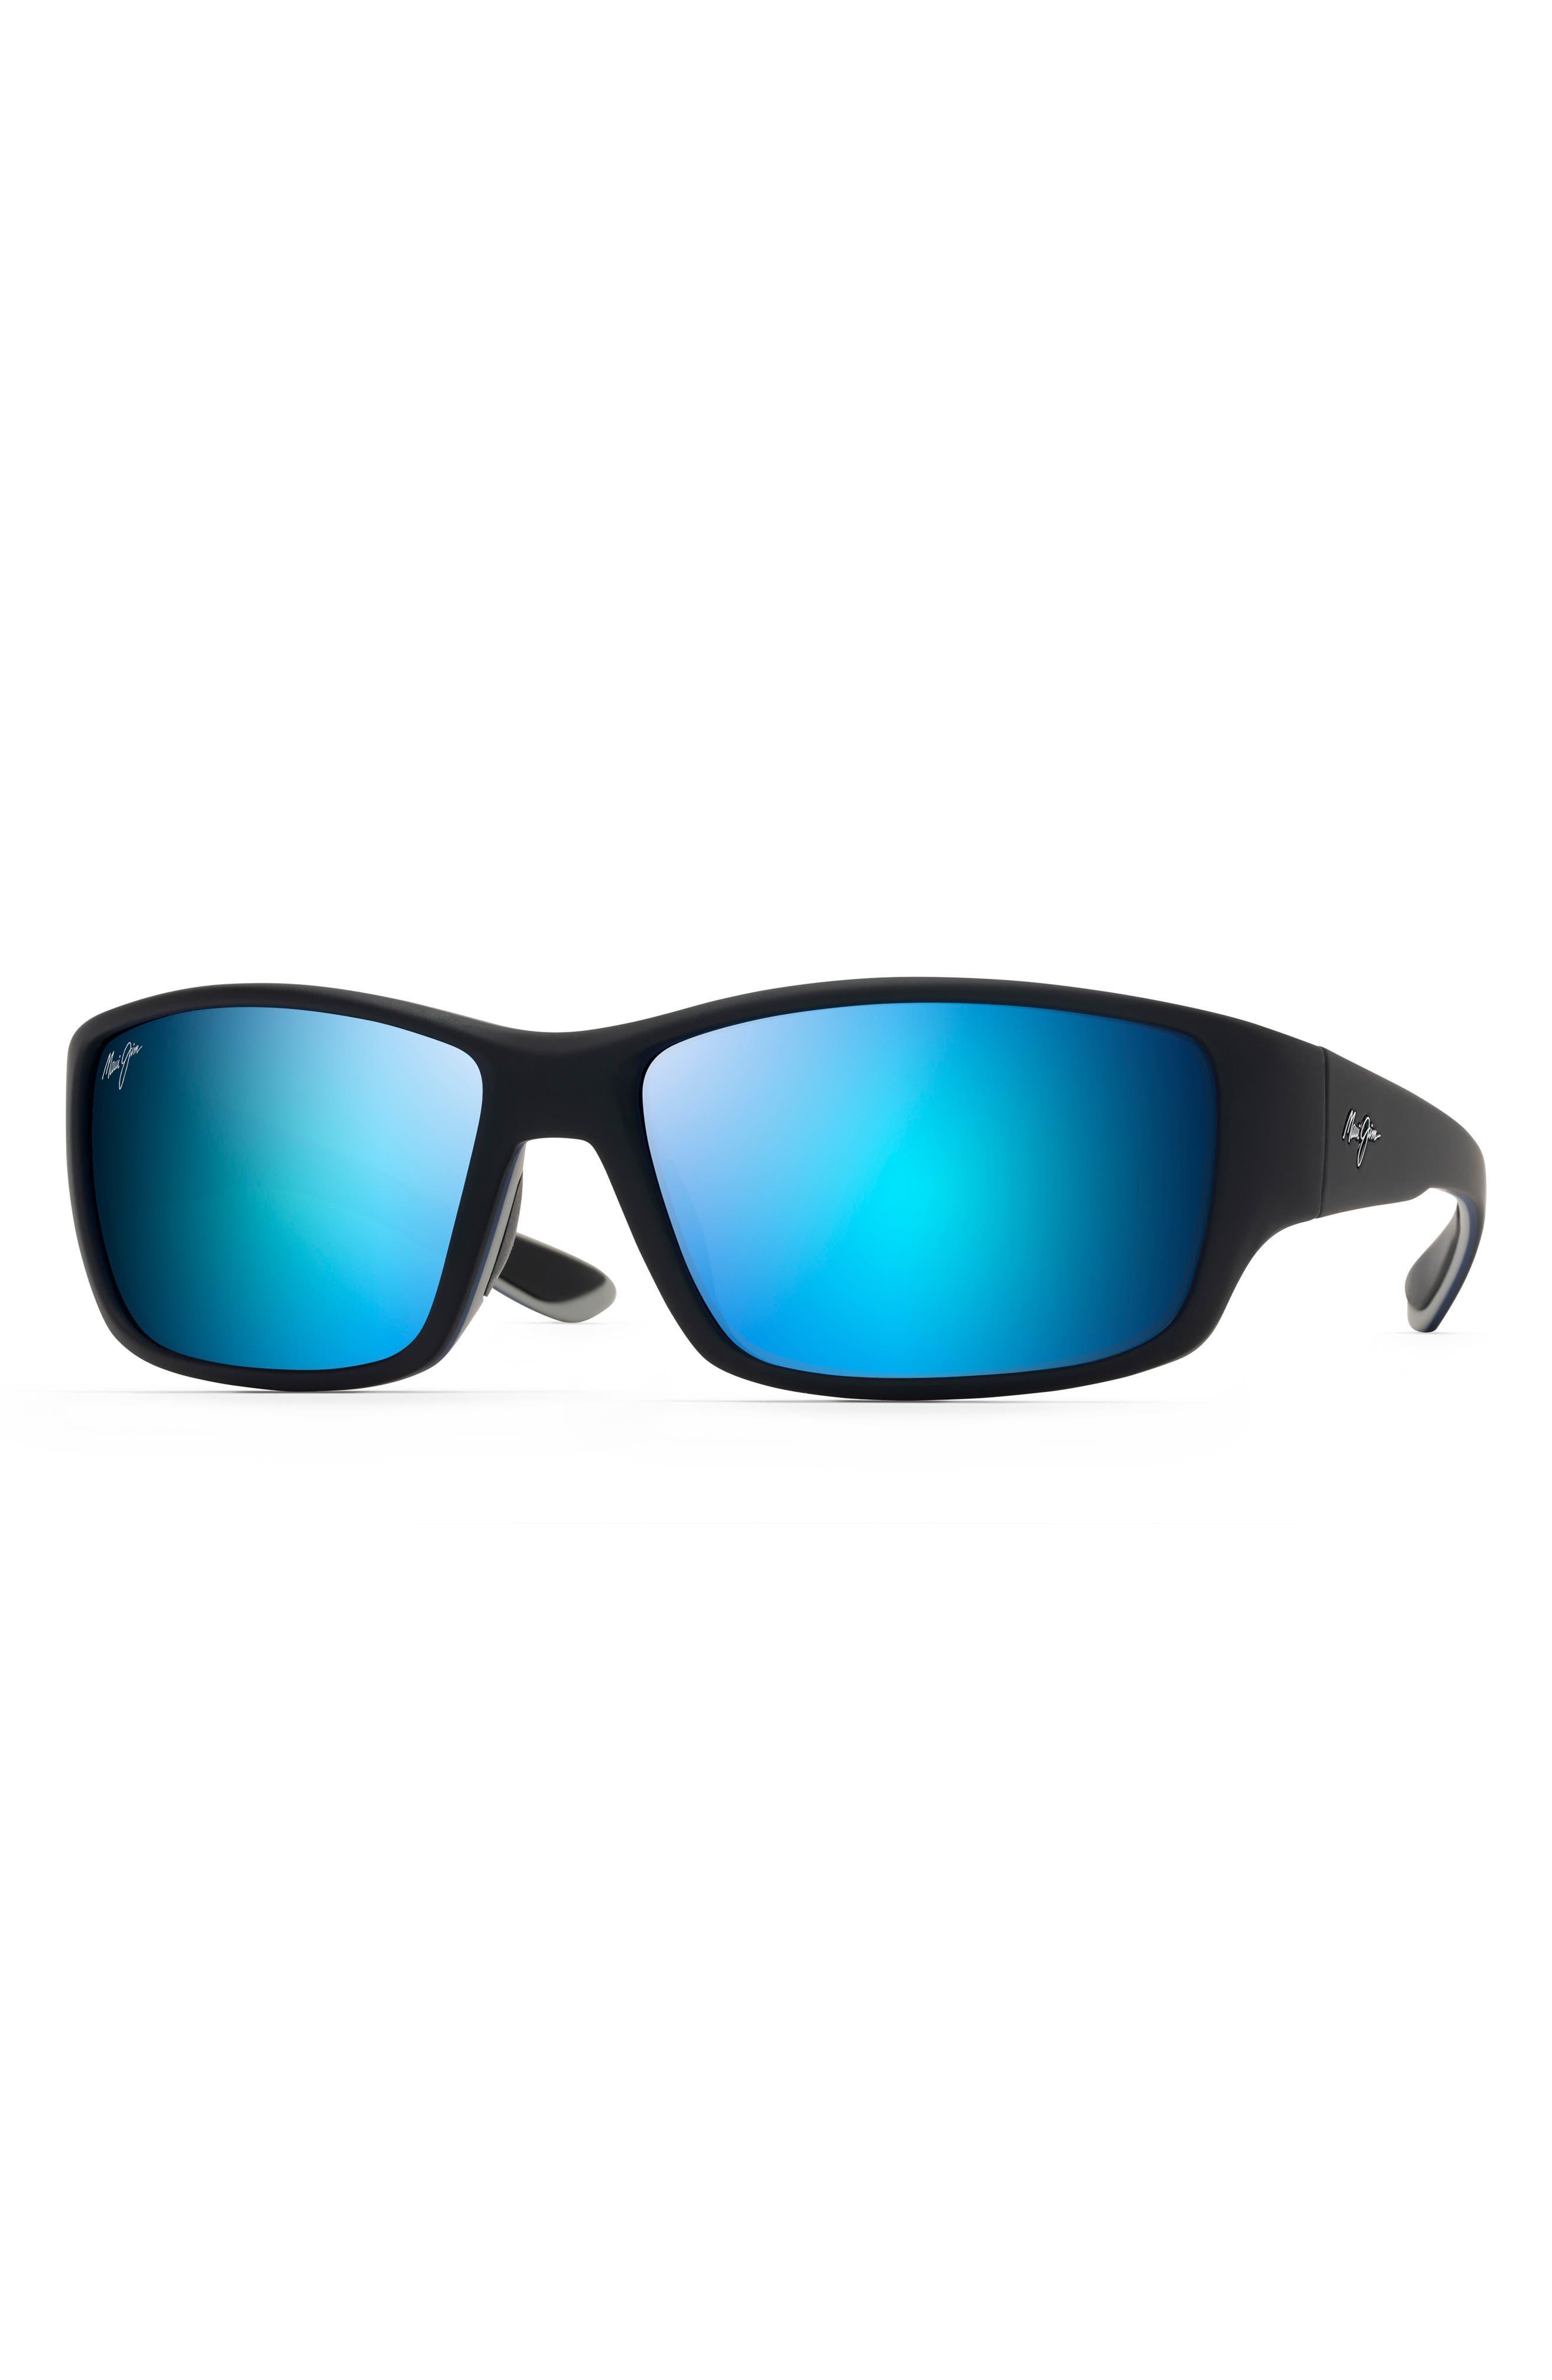 Local Kine 61mm Polarized Wraparound Sunglasses